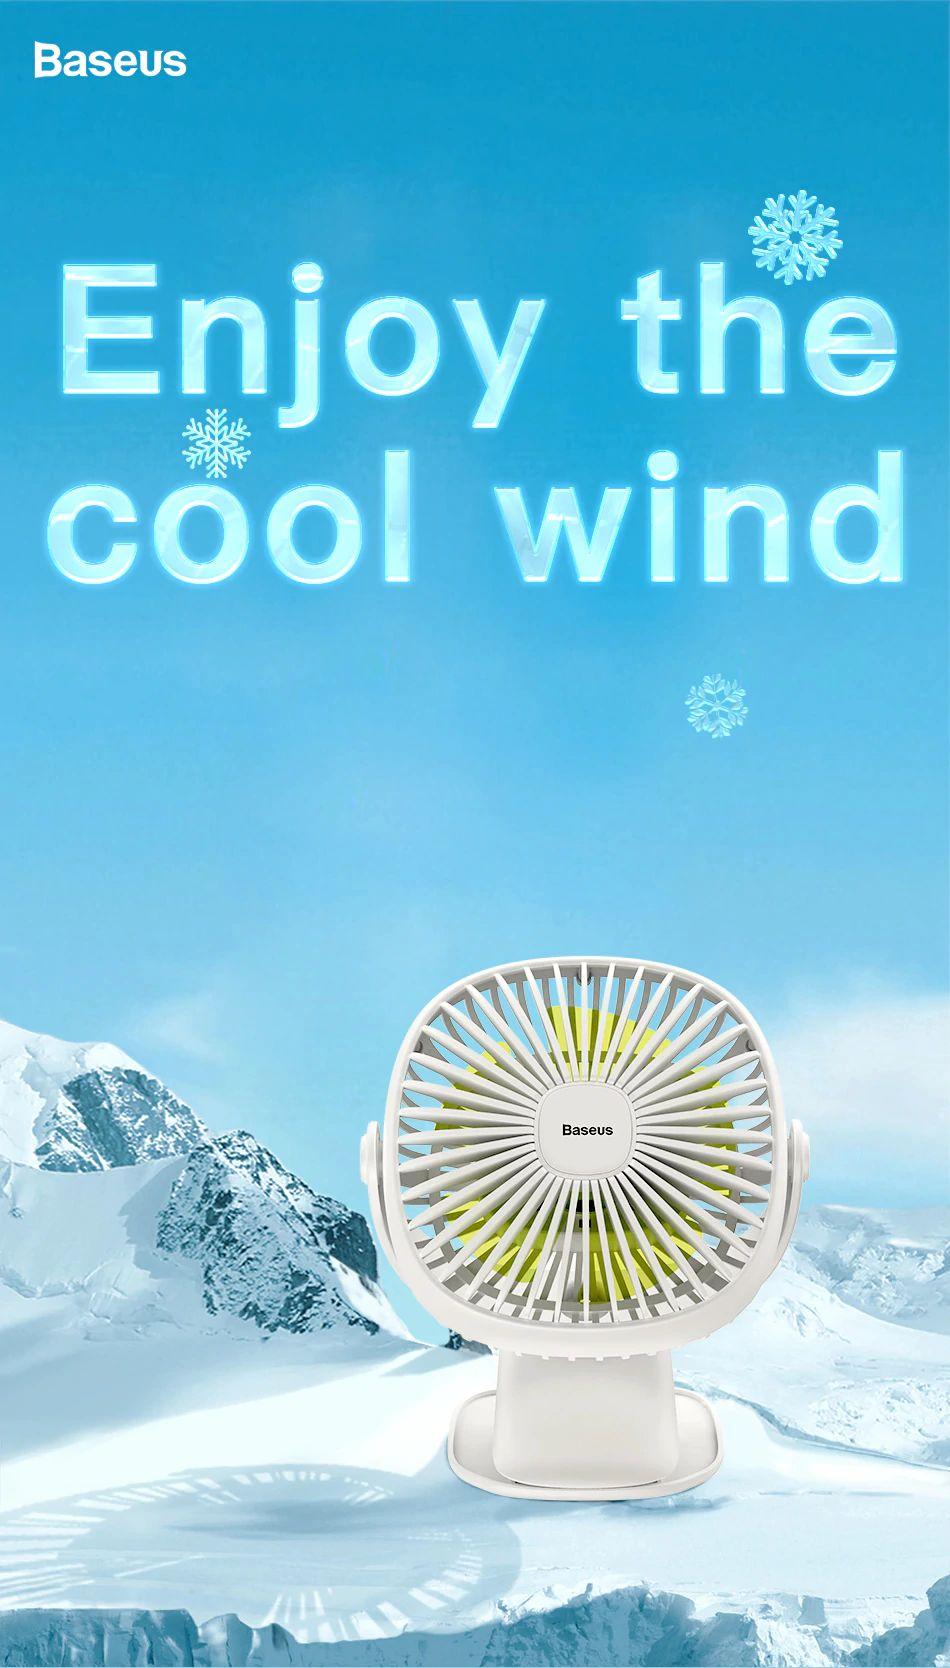 Baseus 2000mah Rechargeable Cooling Fan (7)